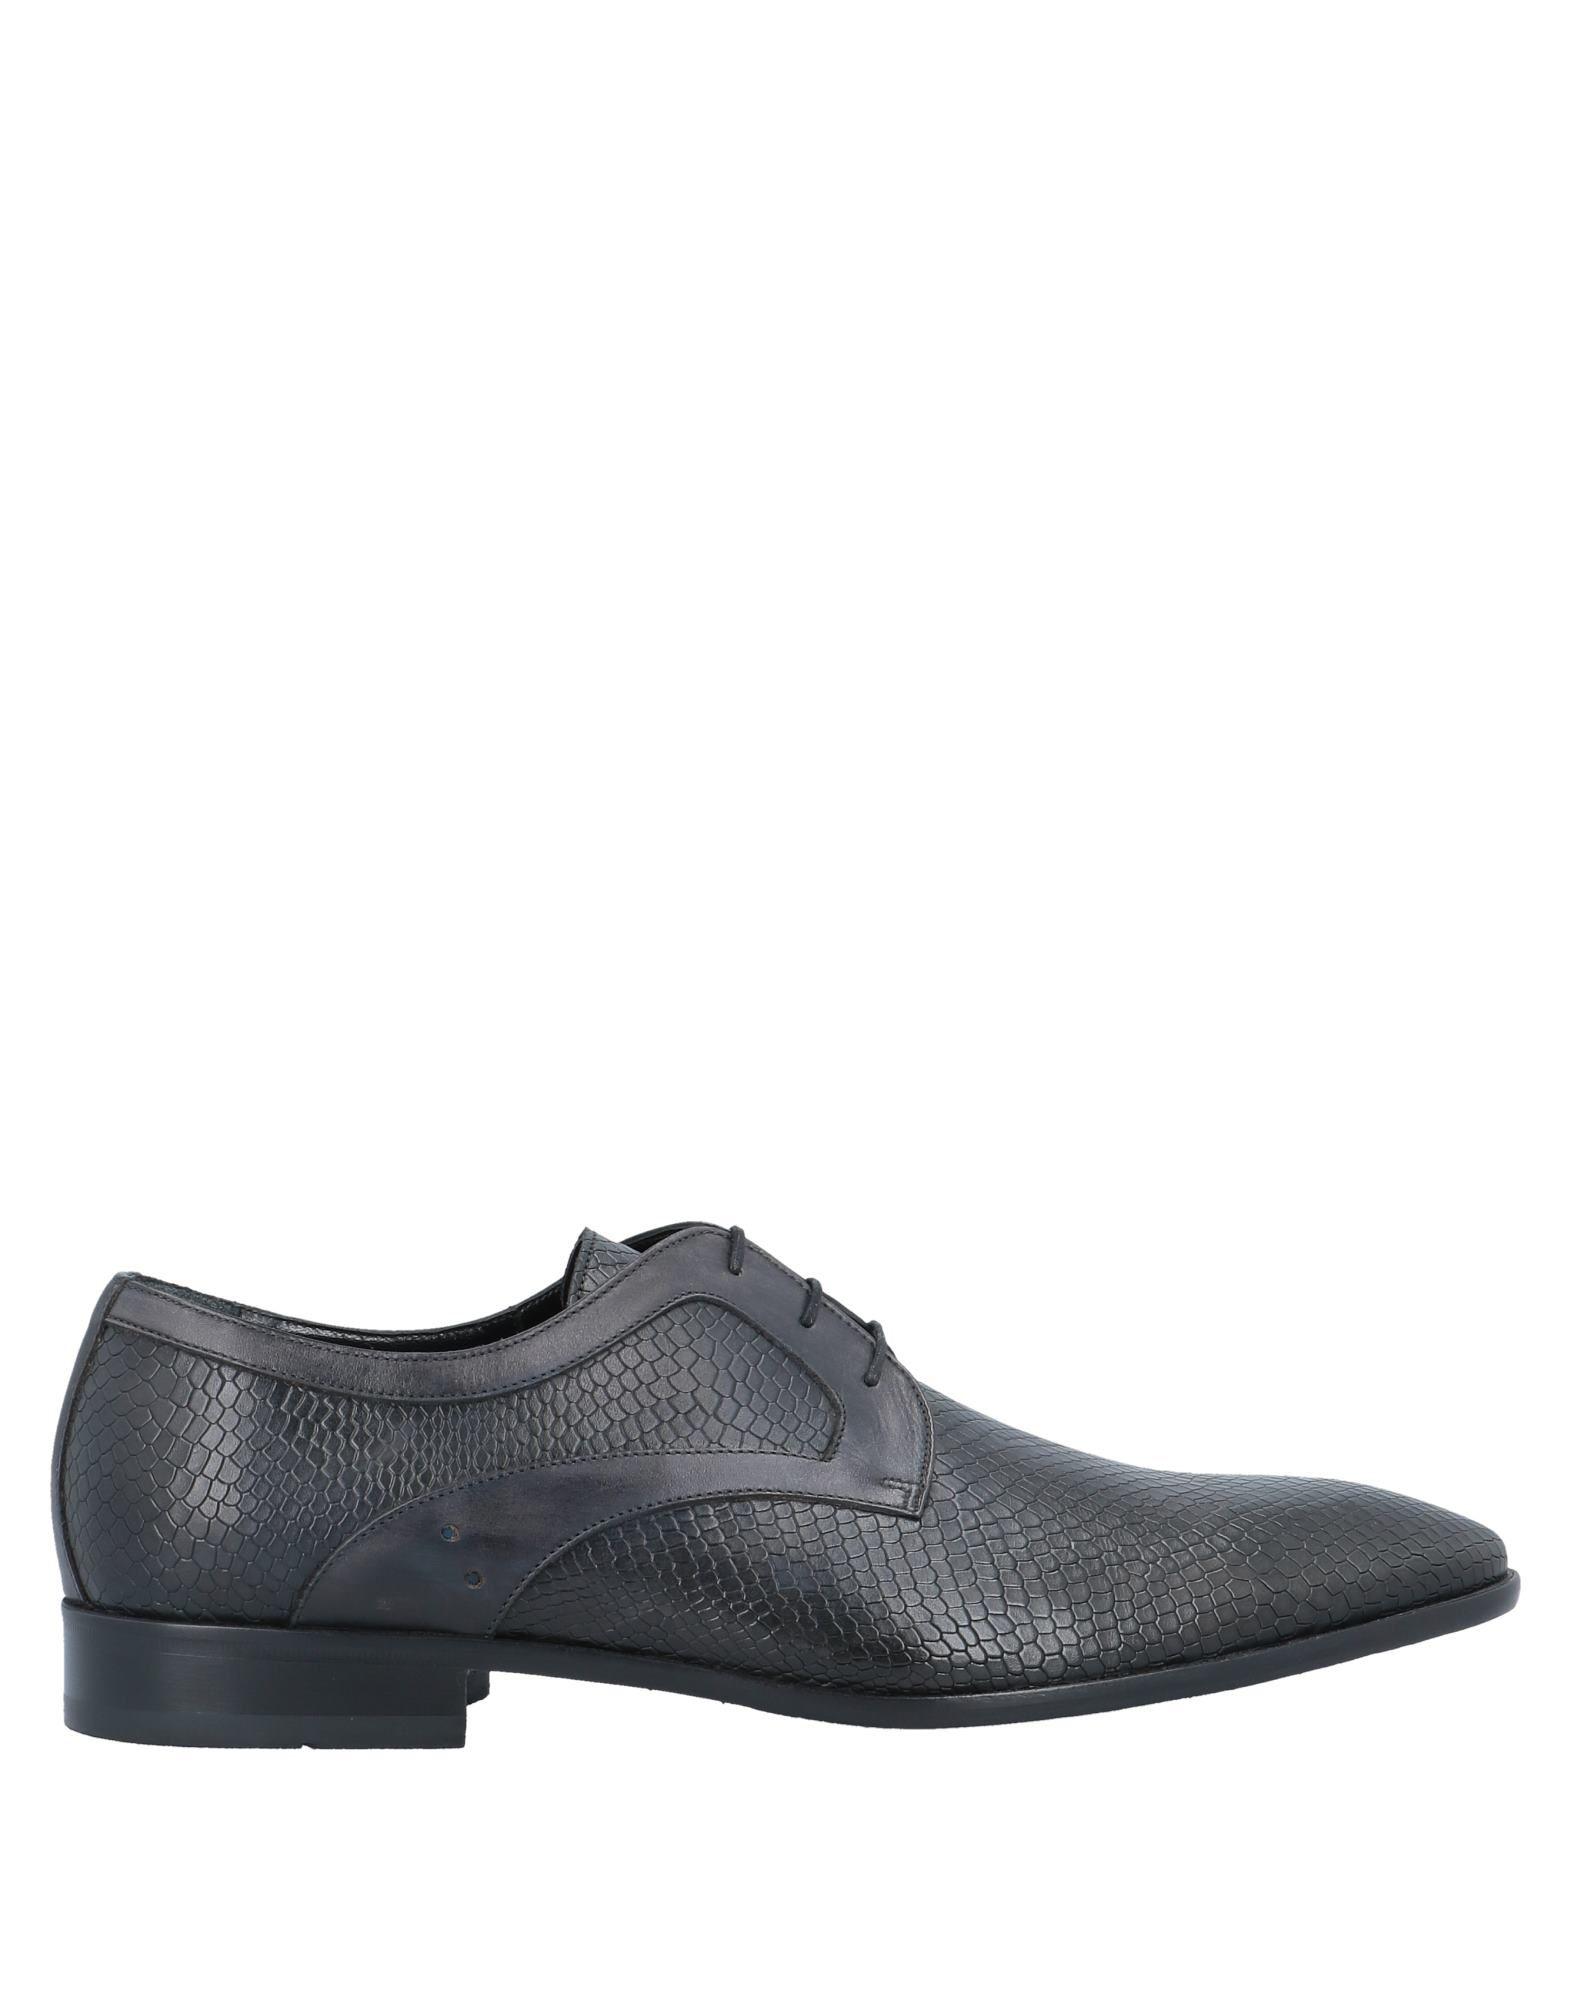 Chaussures À Lacets Cossmo Homme - Chaussures À Lacets Cossmo   - 11735402CJ